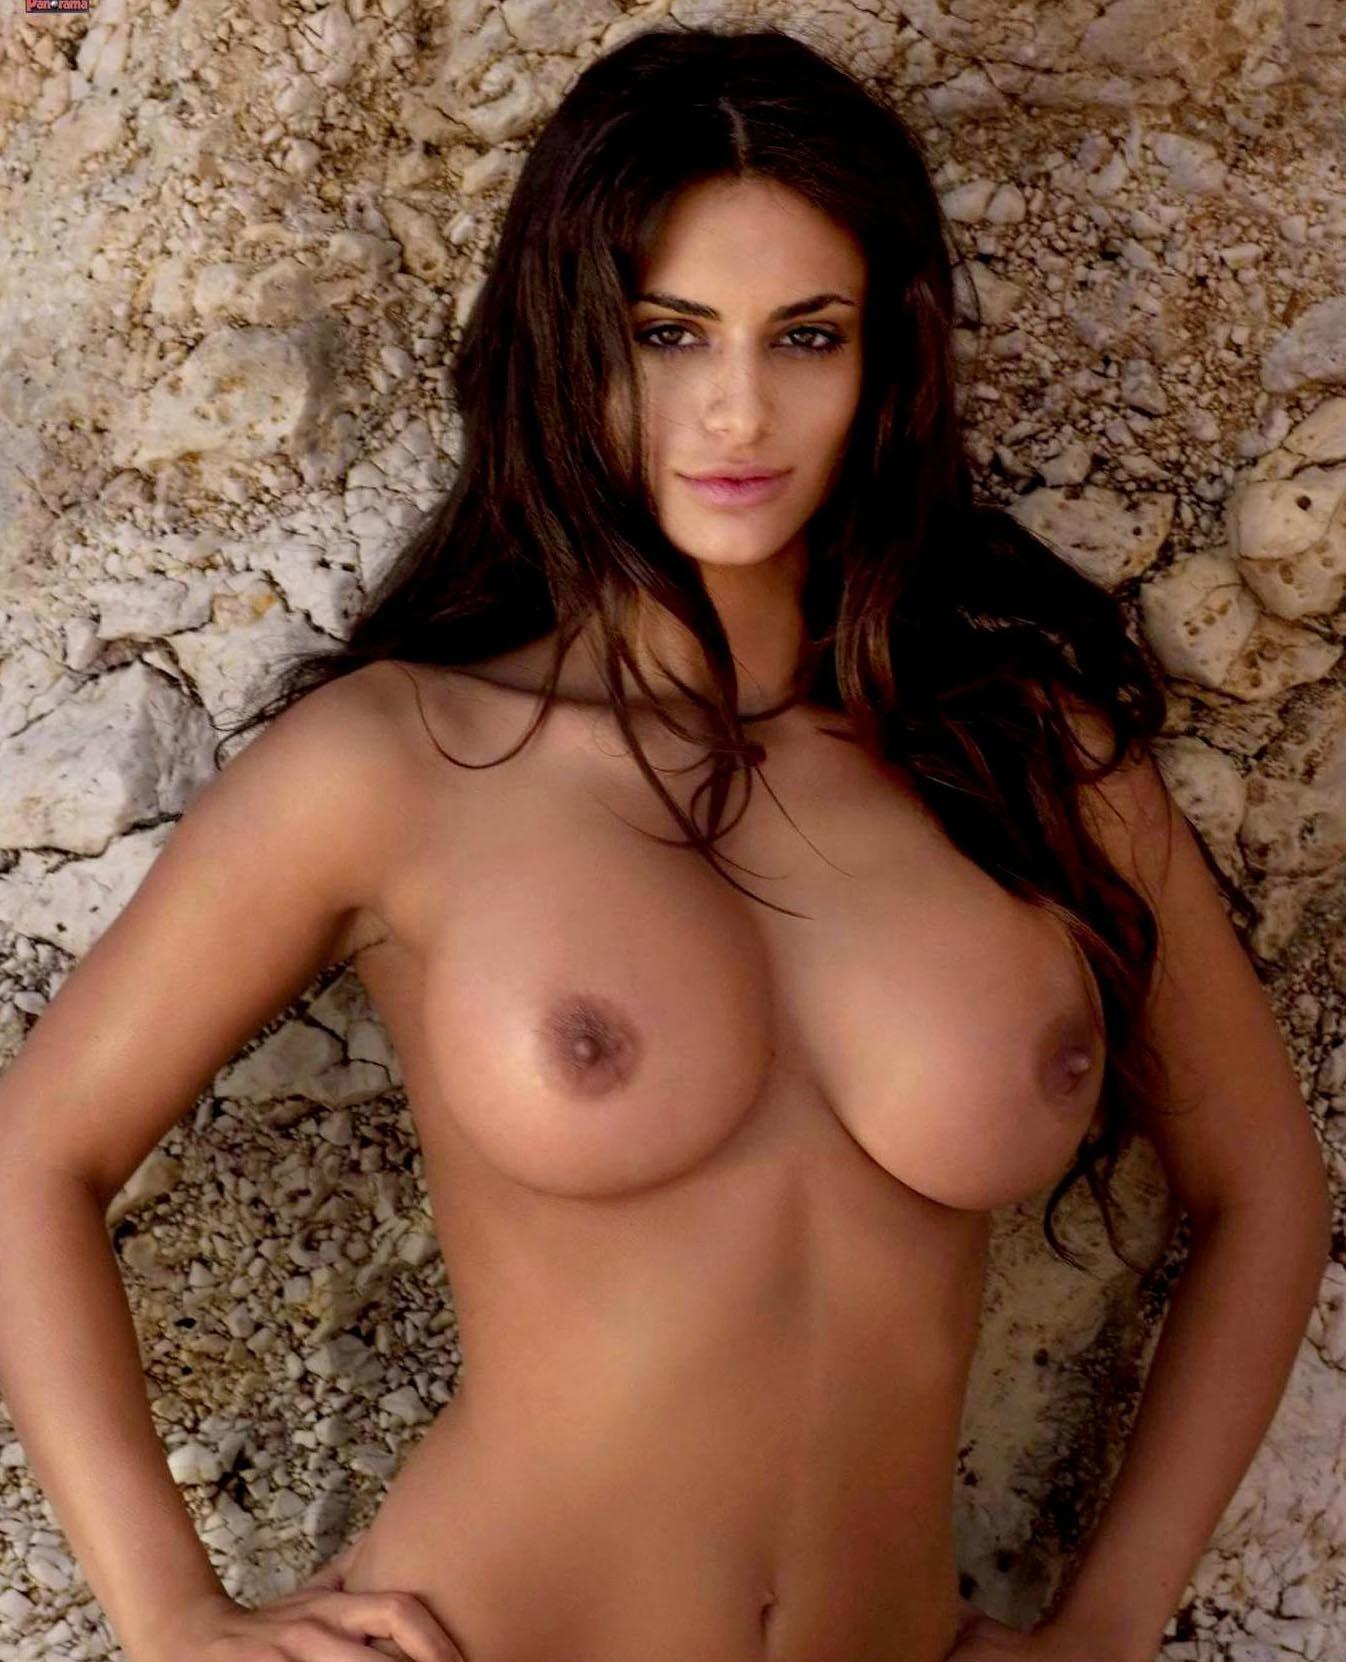 XXX Christina Del Basso nude (32 photos), Feet Celebrites picture